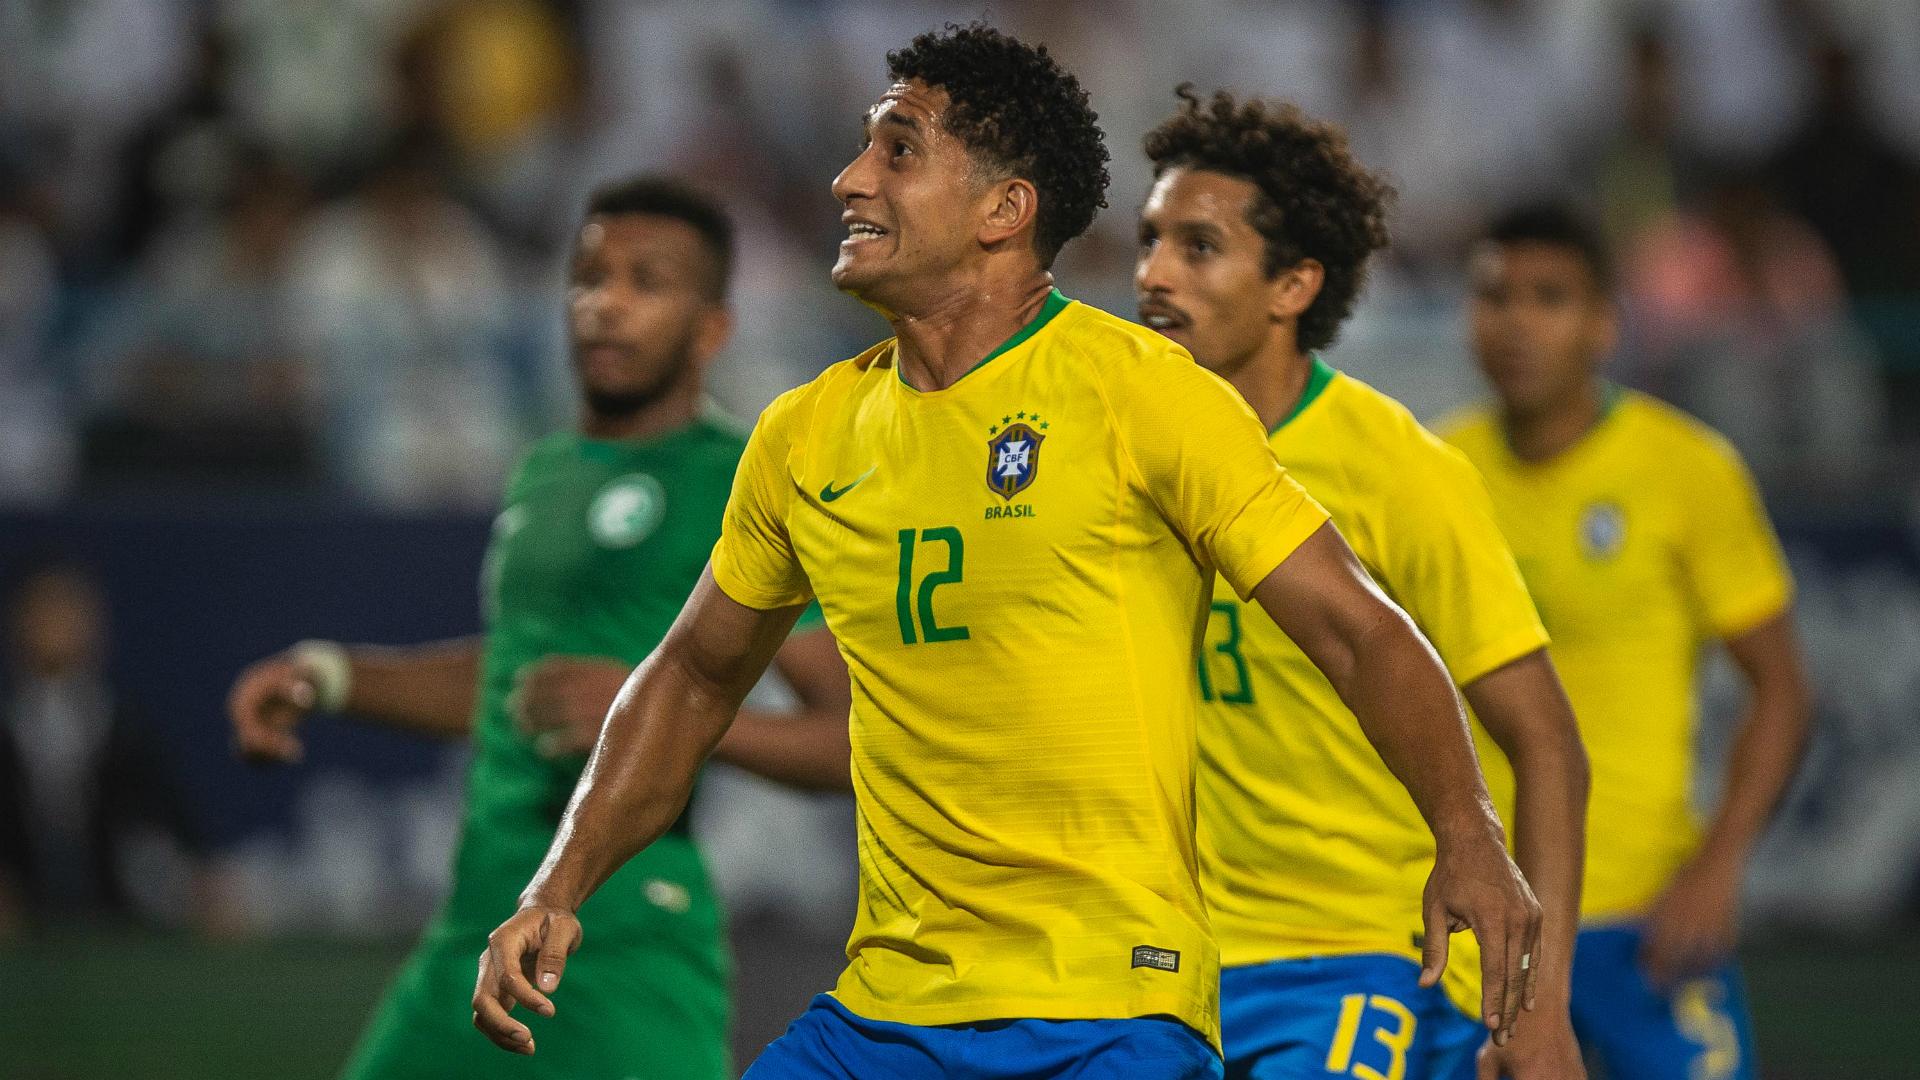 Pablo Brazil Saudi Arabia 12102018